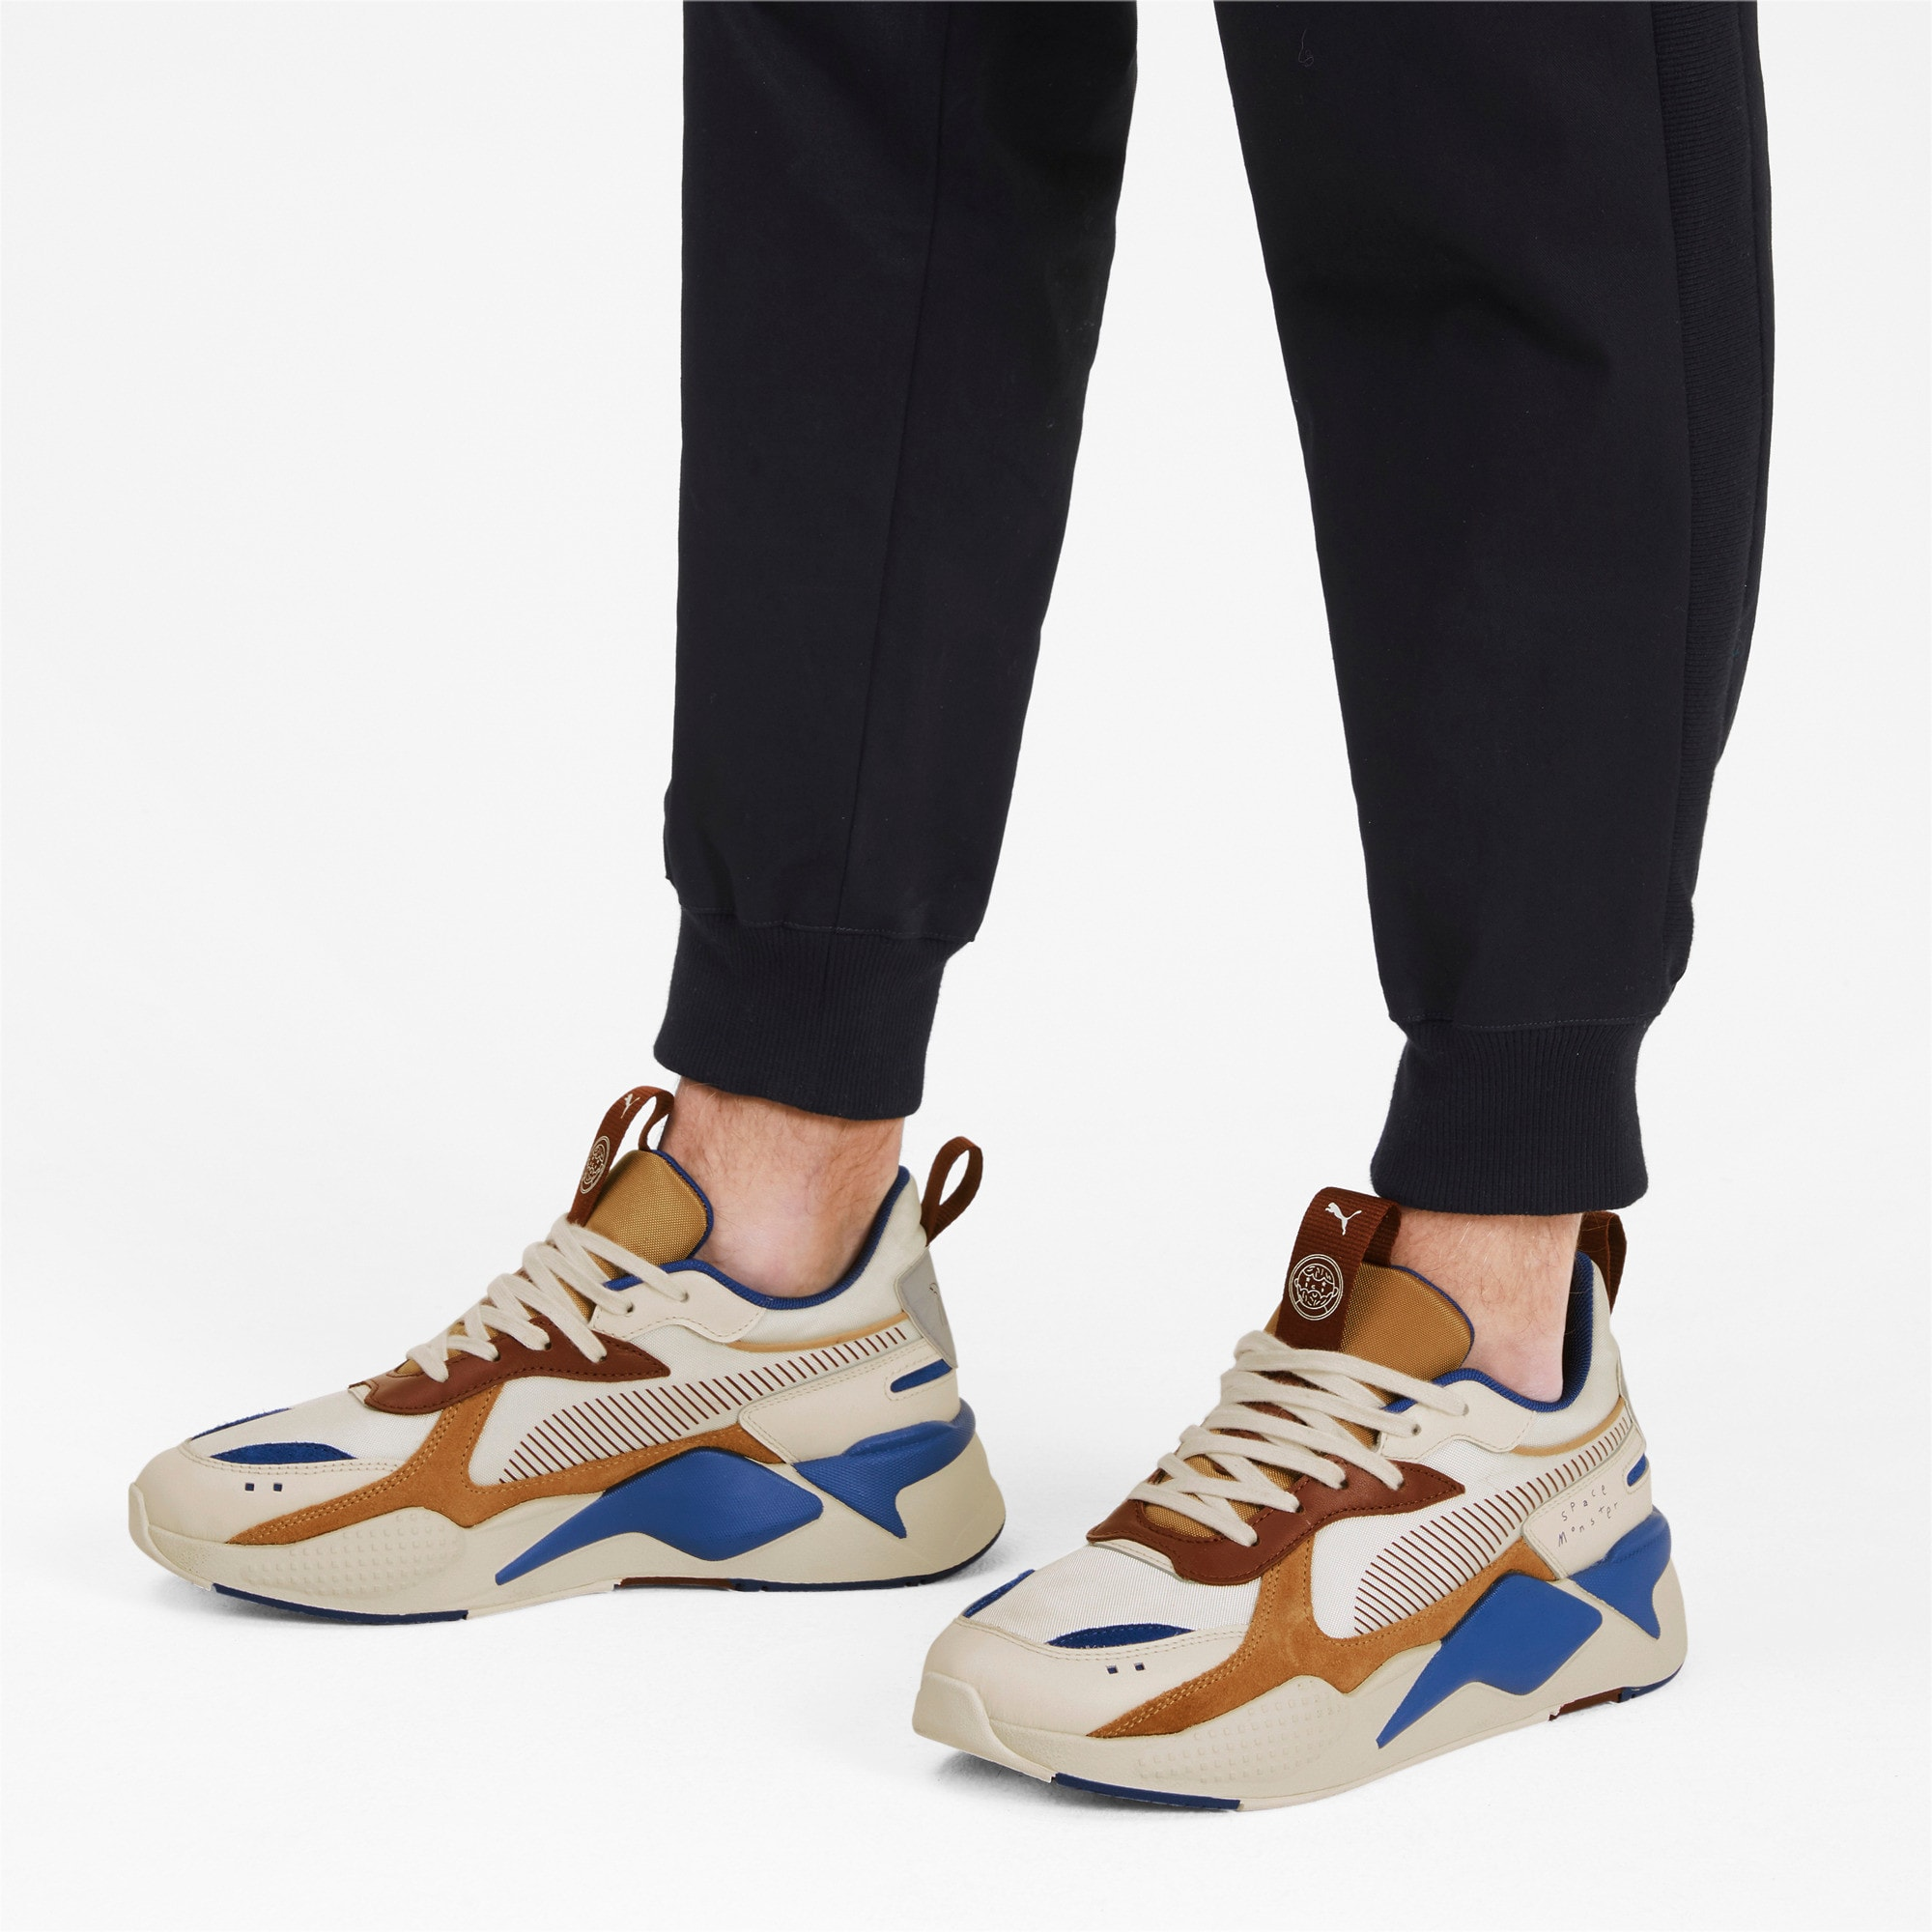 Thumbnail 3 of PUMA x TYAKASHA RS-X Sneakers, Whisper White-Fired Brick, medium